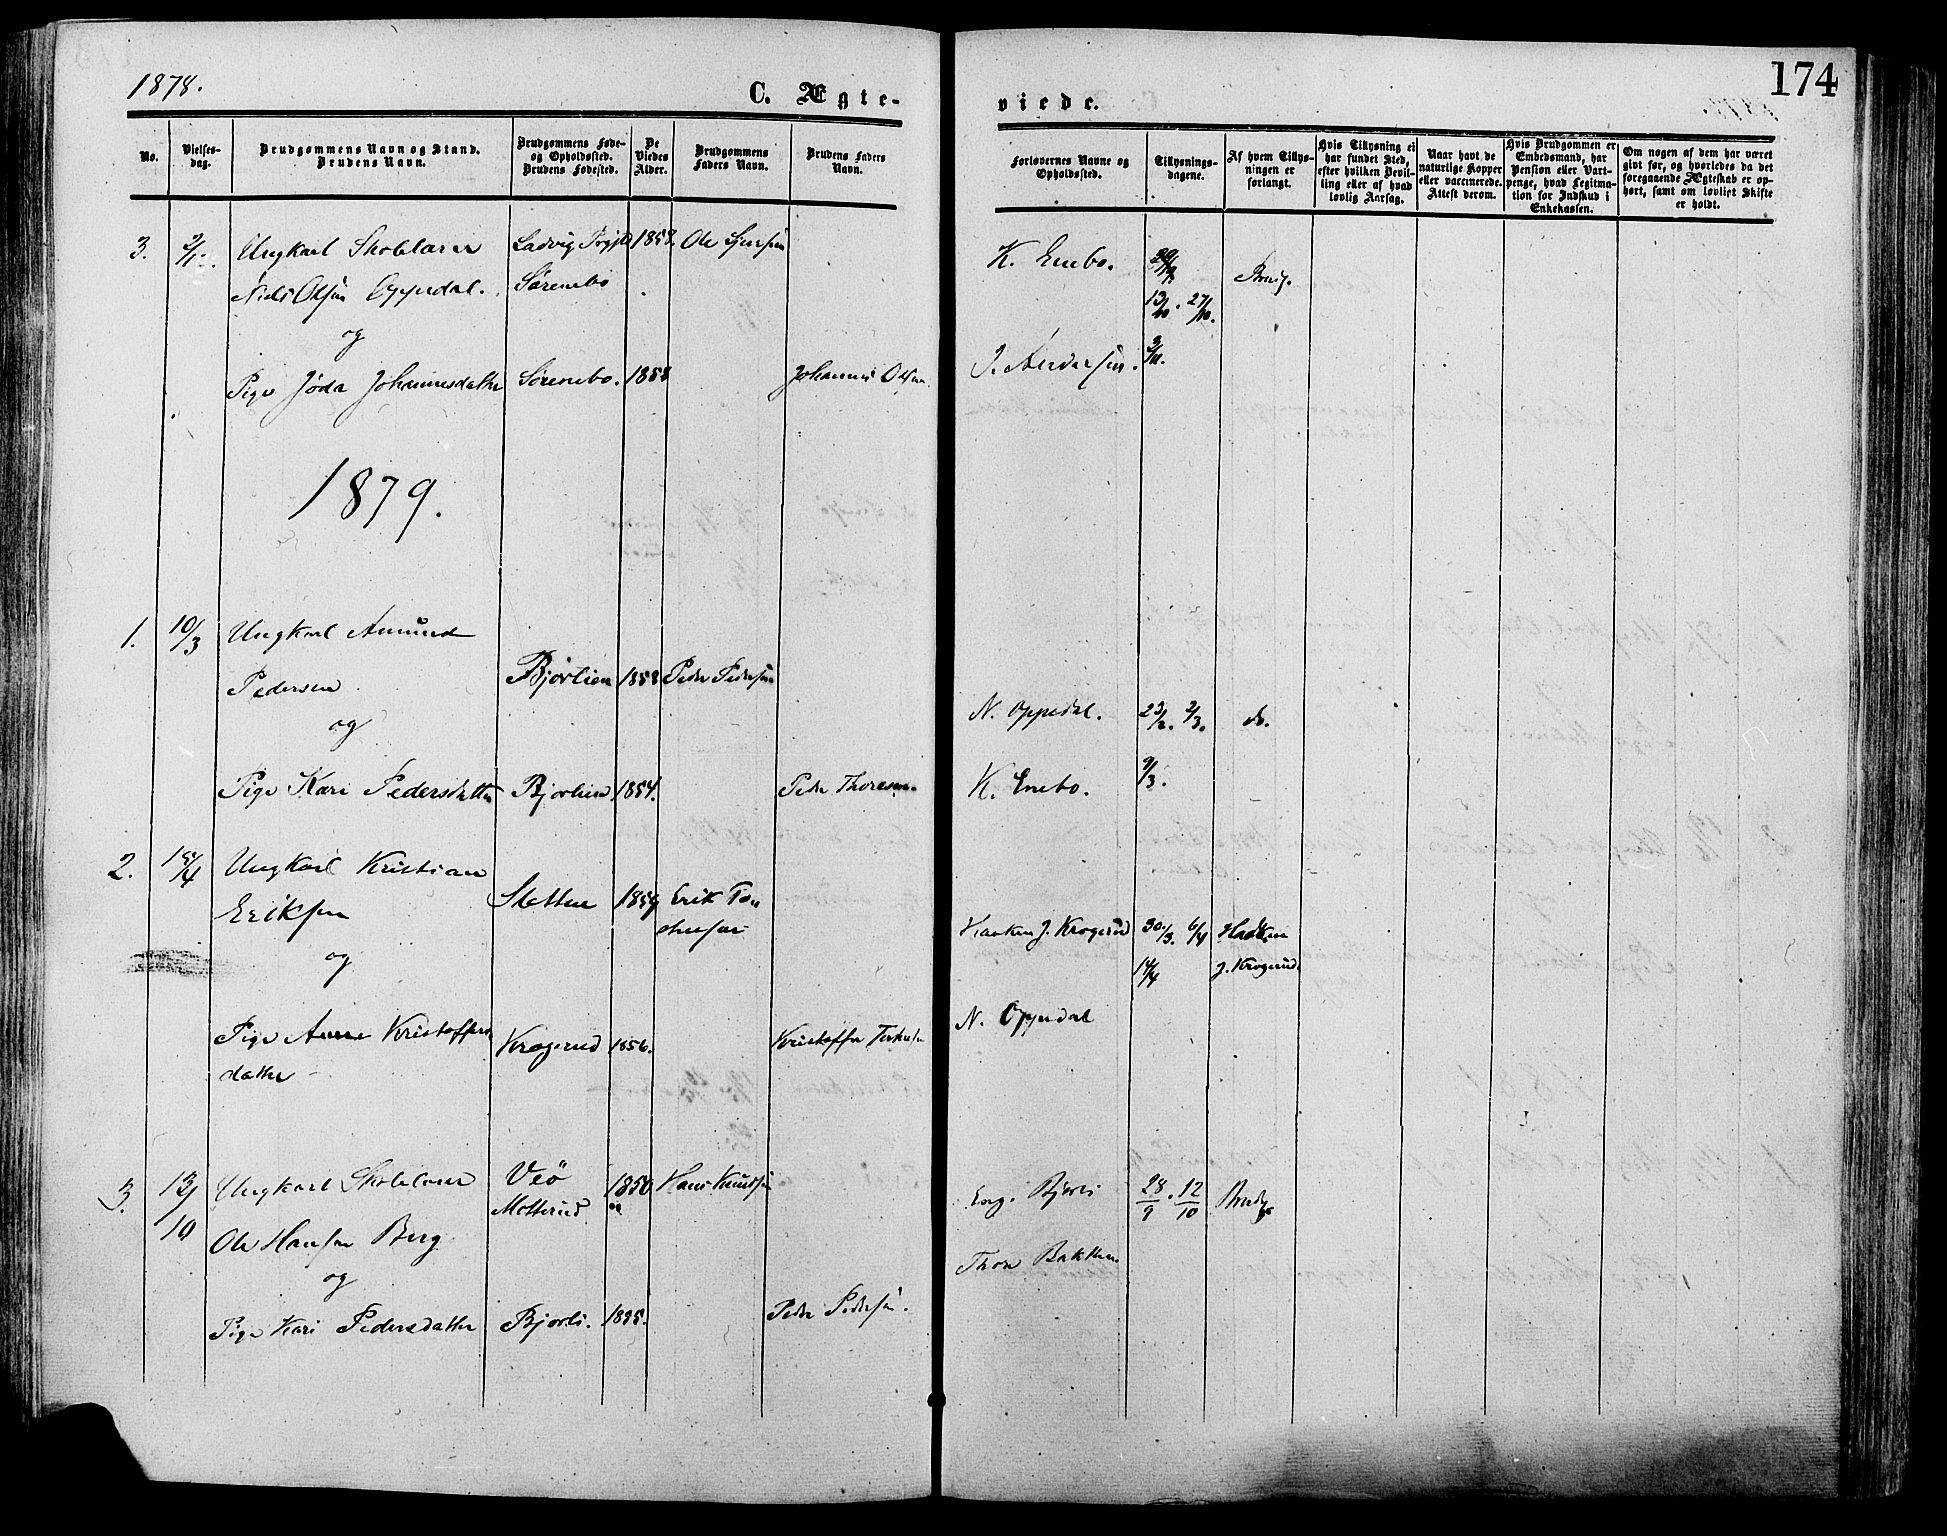 SAH, Lesja prestekontor, Ministerialbok nr. 9, 1854-1889, s. 174